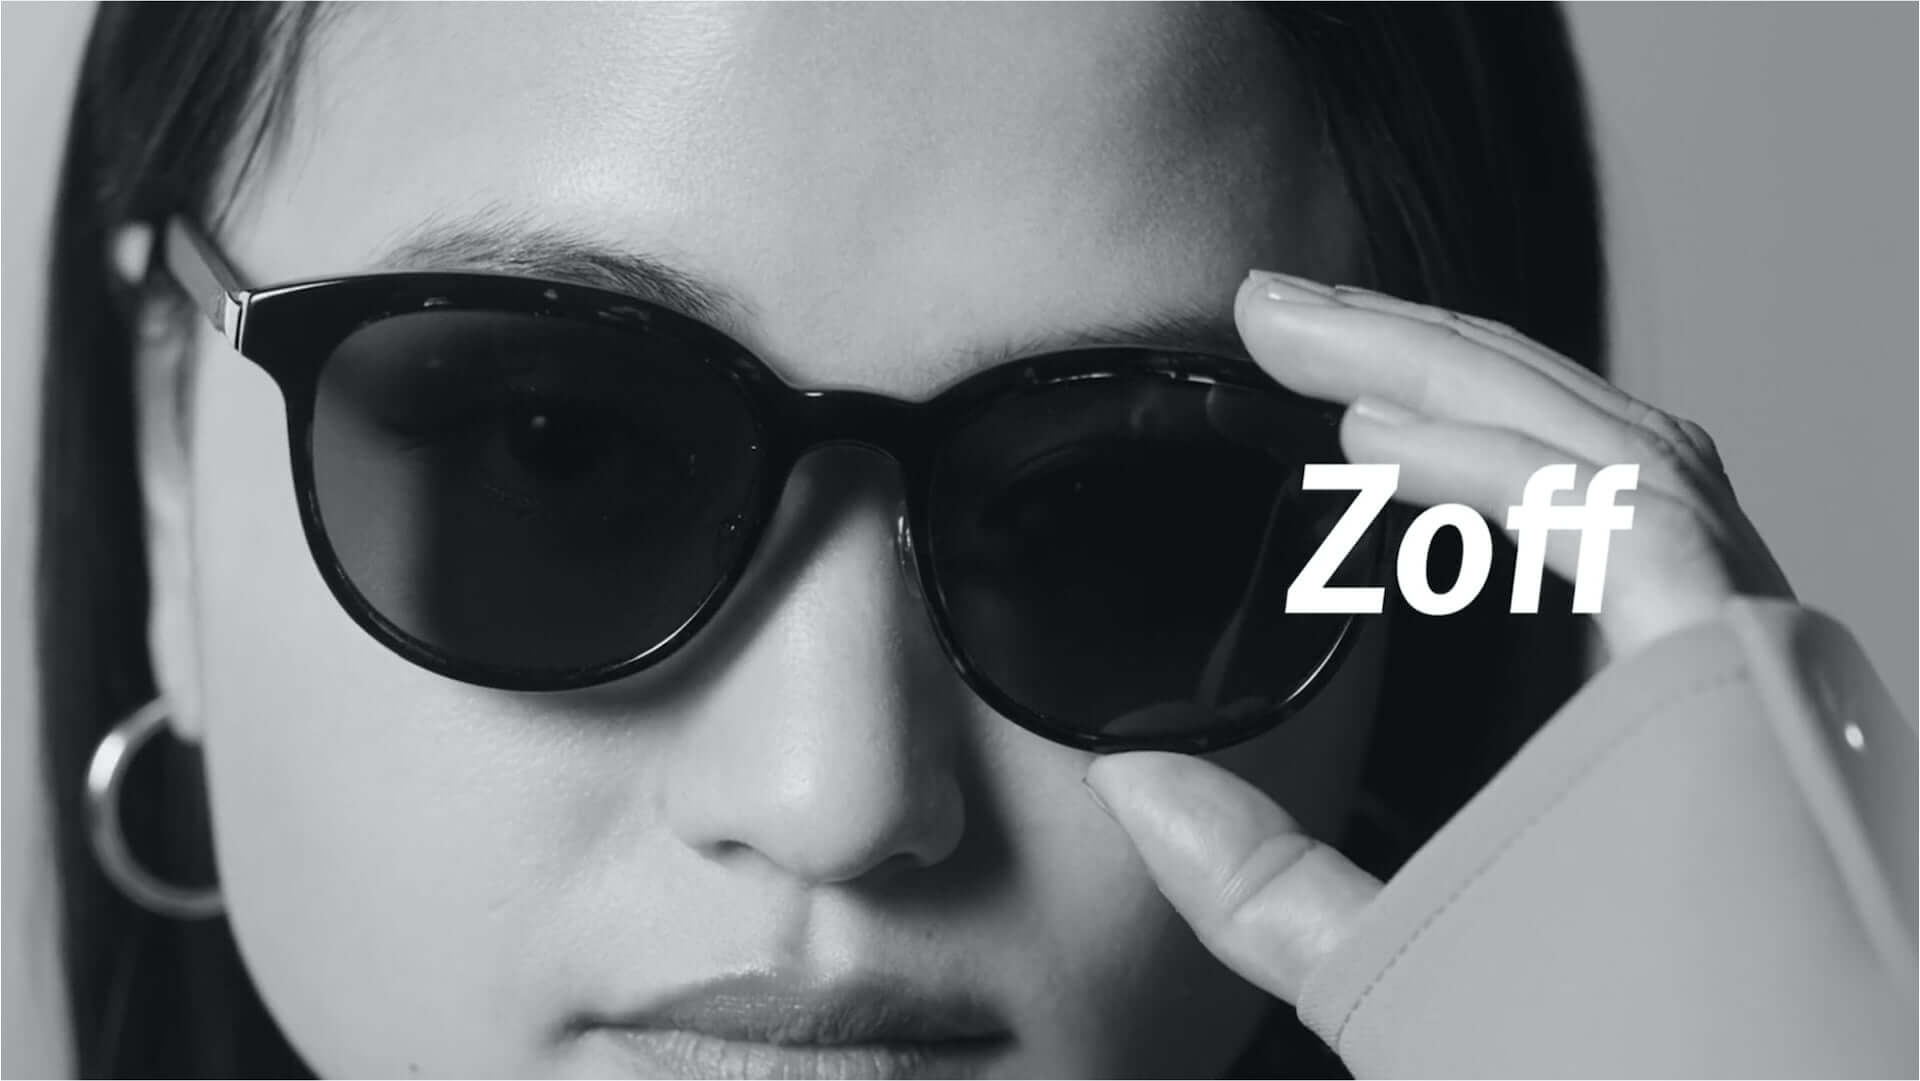 iriとLUCKY TAPESが出演!2WAYグラス『Zoff NIGHT&DAY』のムービーが公開&<Zoff Rock 2020>の開催も決定 music200324_zoff_movie_2-1920x1081